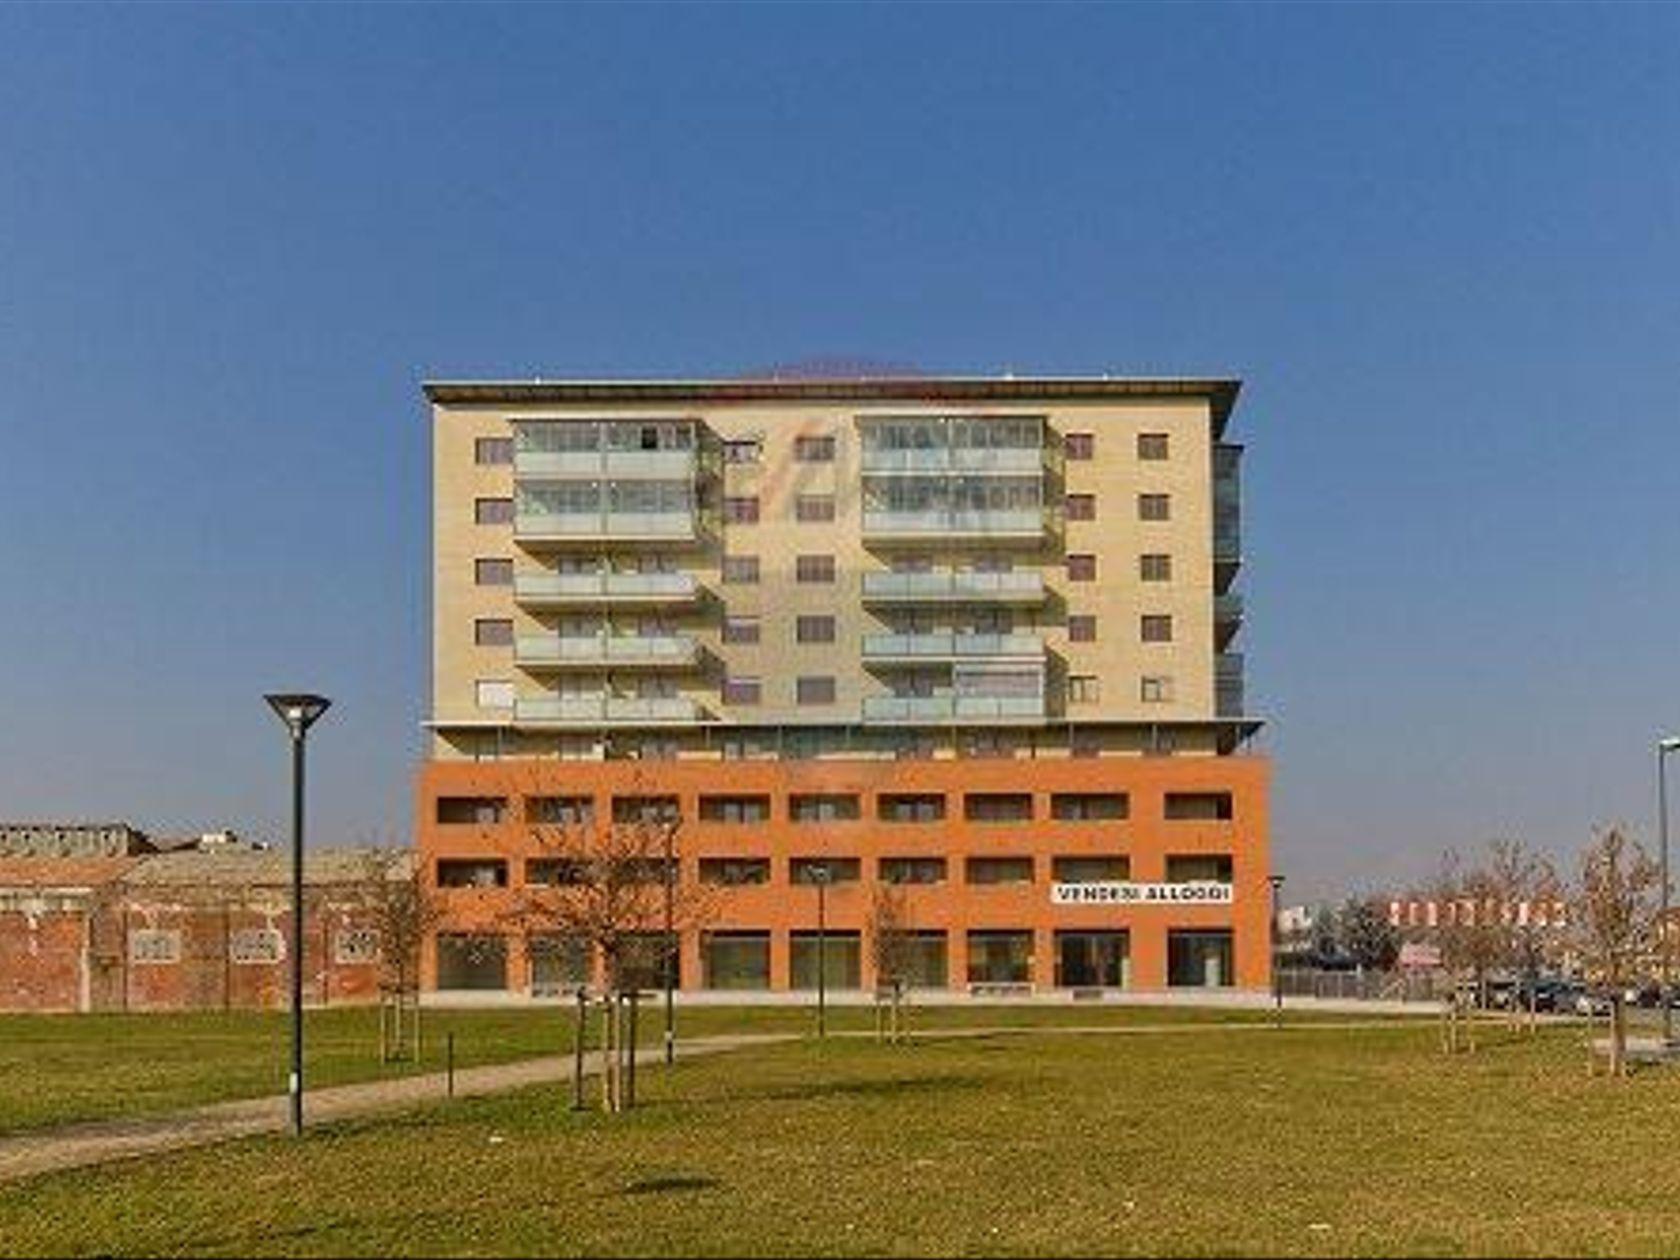 Appartamento Torino-madonna Di Campagna Borgo Vittoria Barrlanz, Torino, TO Vendita - Foto 3